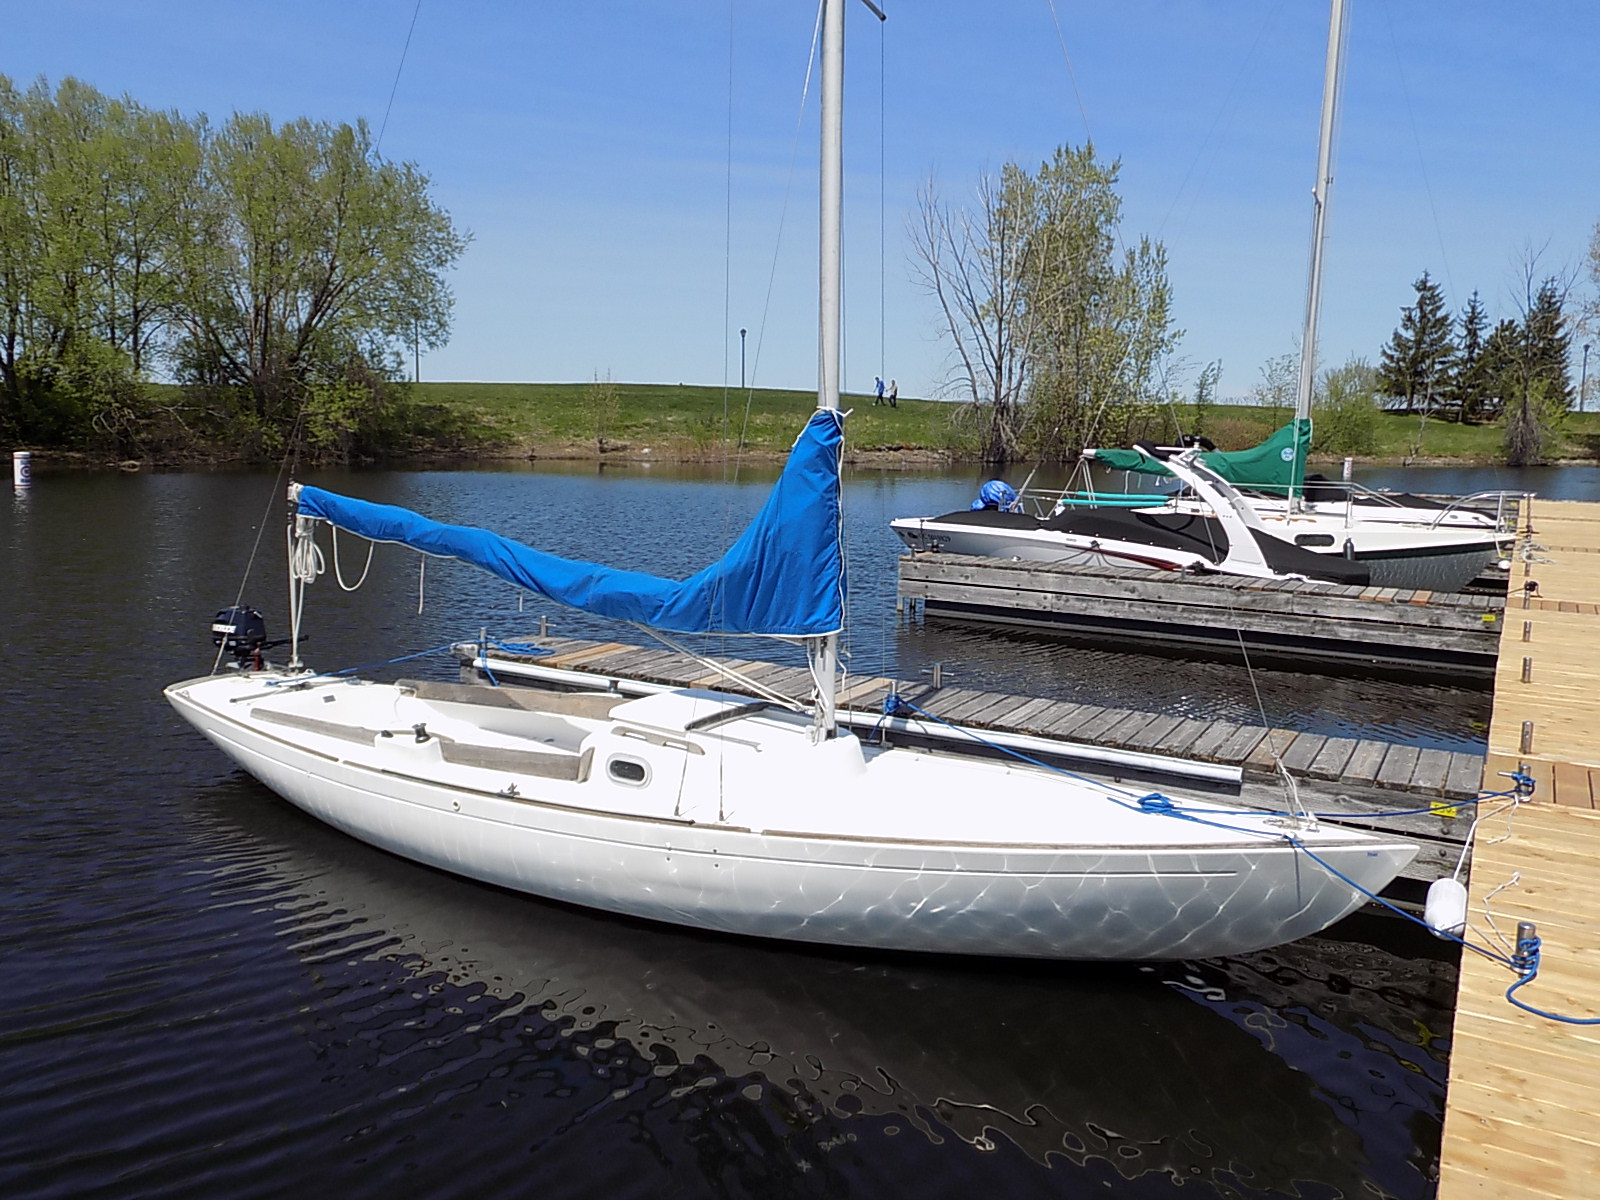 Bluenose one-design sloop - Wikipedia